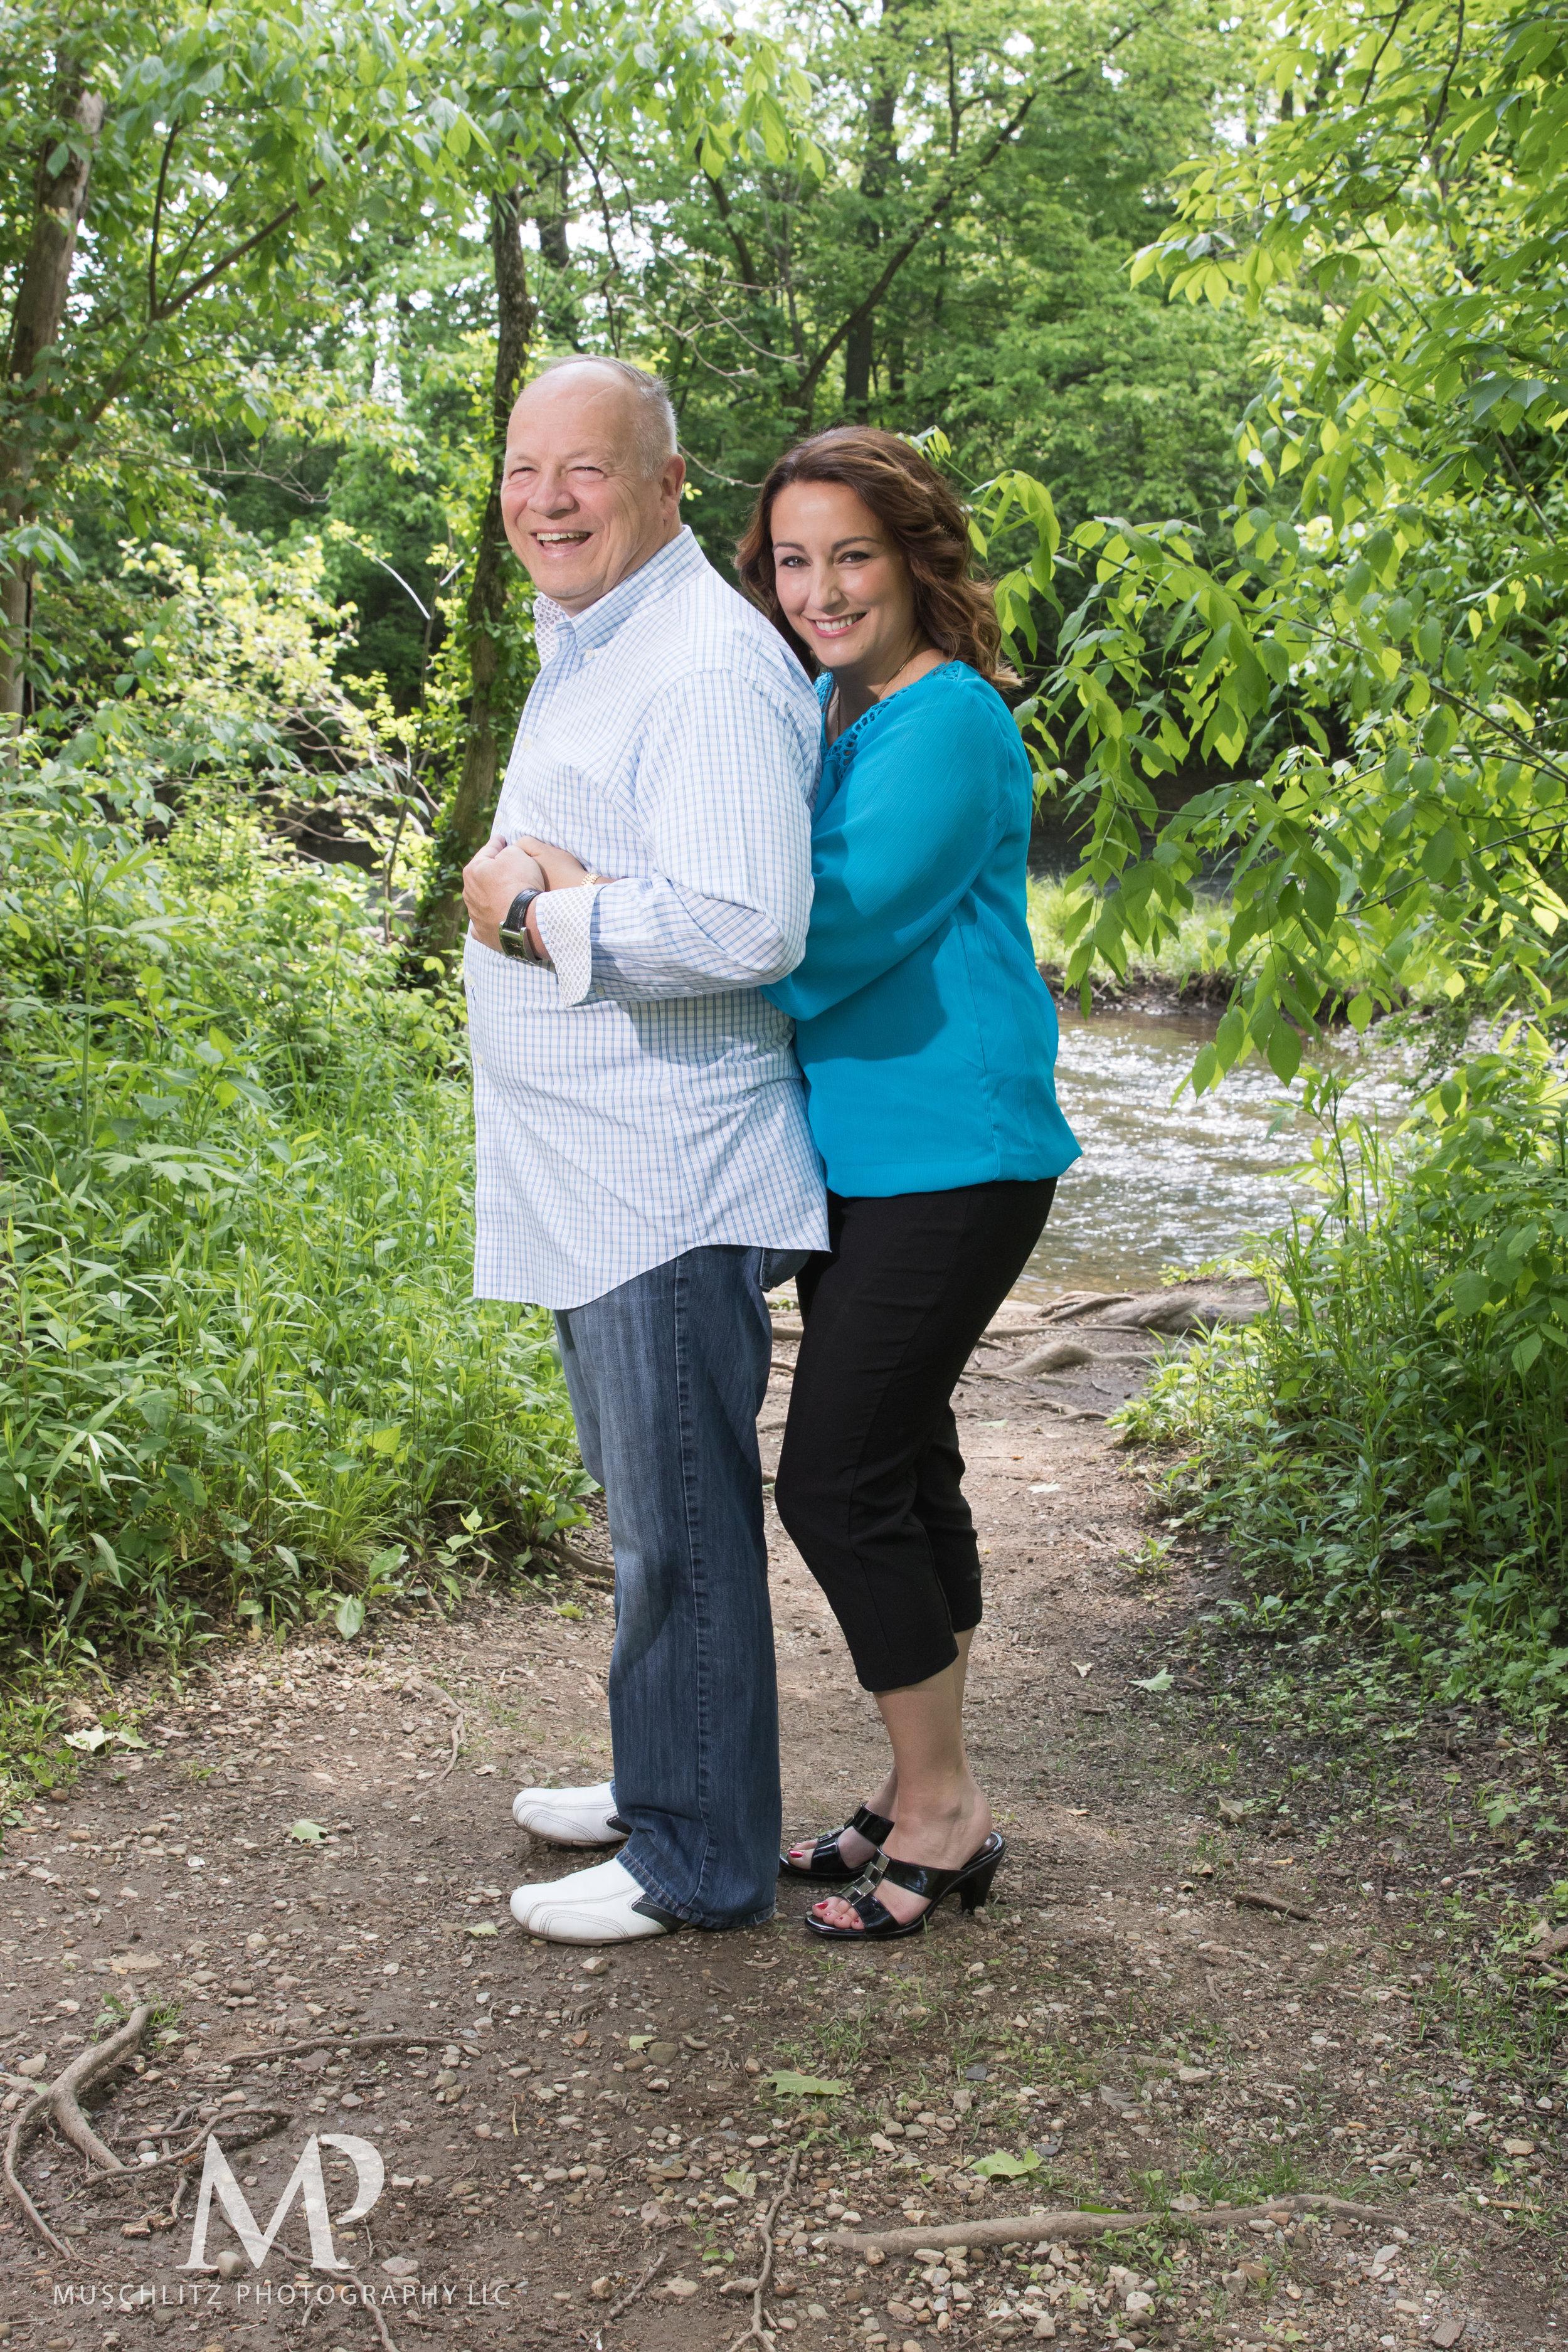 anniversary-couple-portrait-session-creekside-park-plaza-gahanna-ohio-boxer-dog-muschlitz-photography-008.JPG